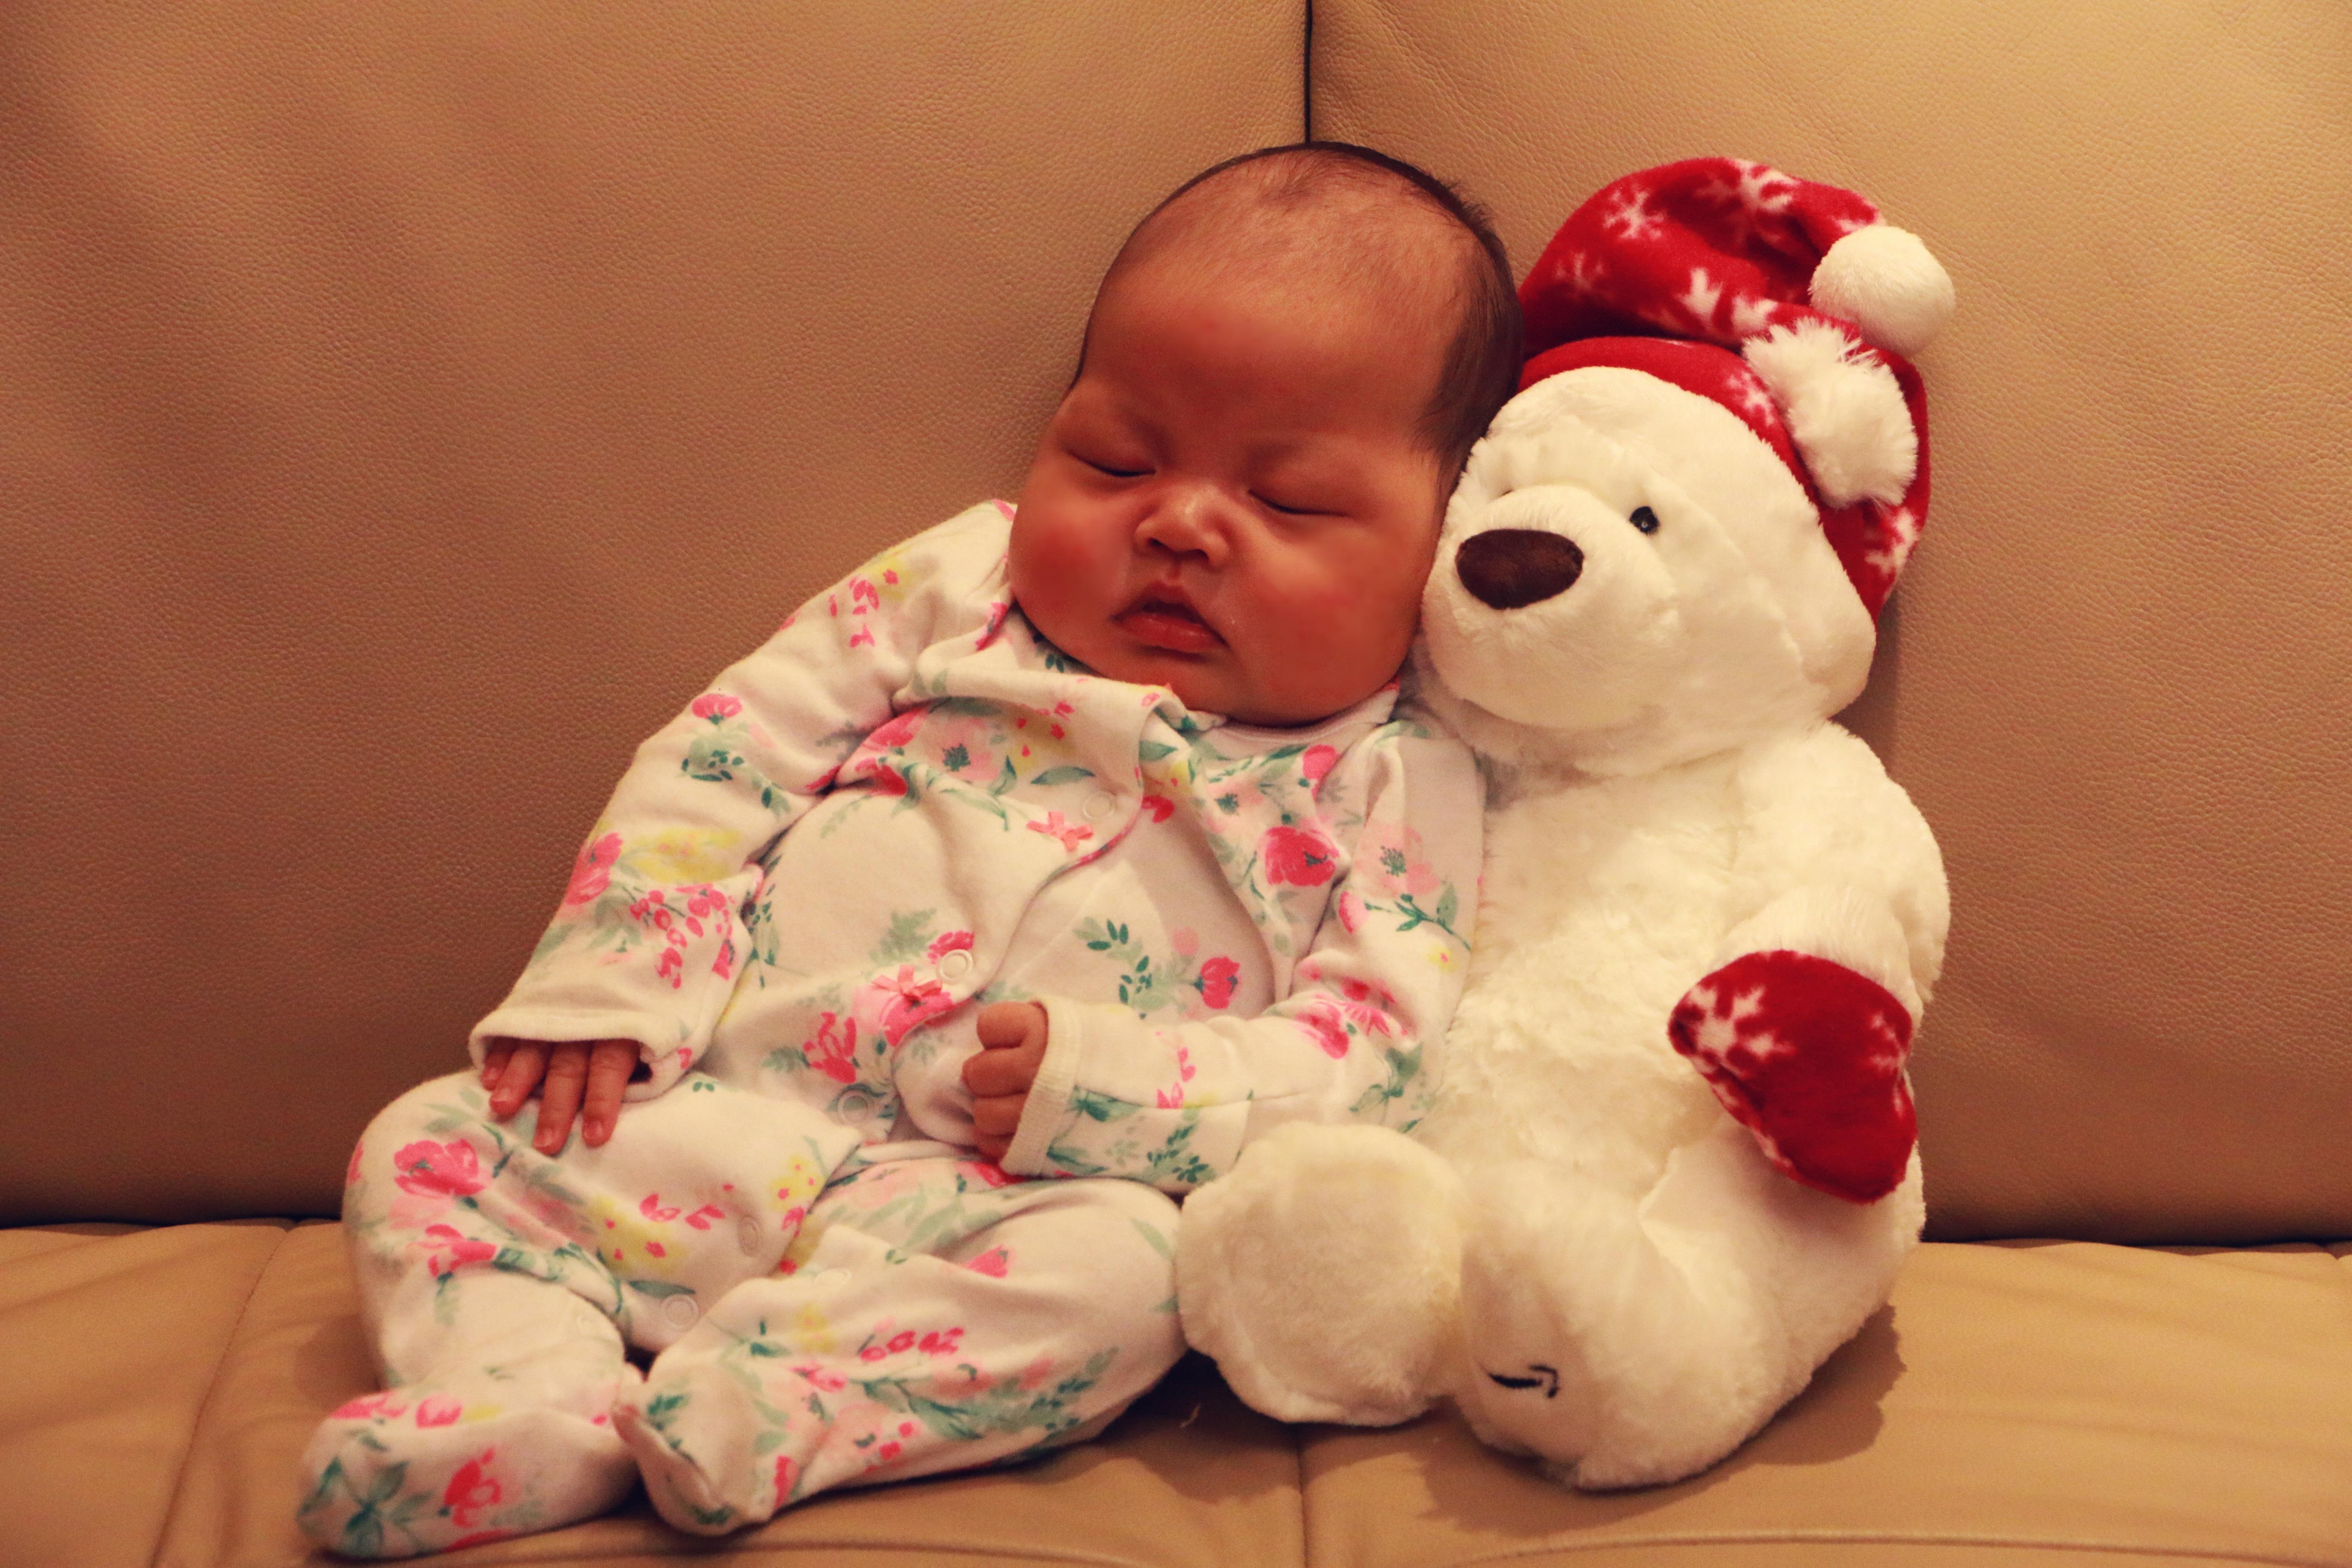 Free images person cute child clothing pink - Que regalar en un bautizo ...